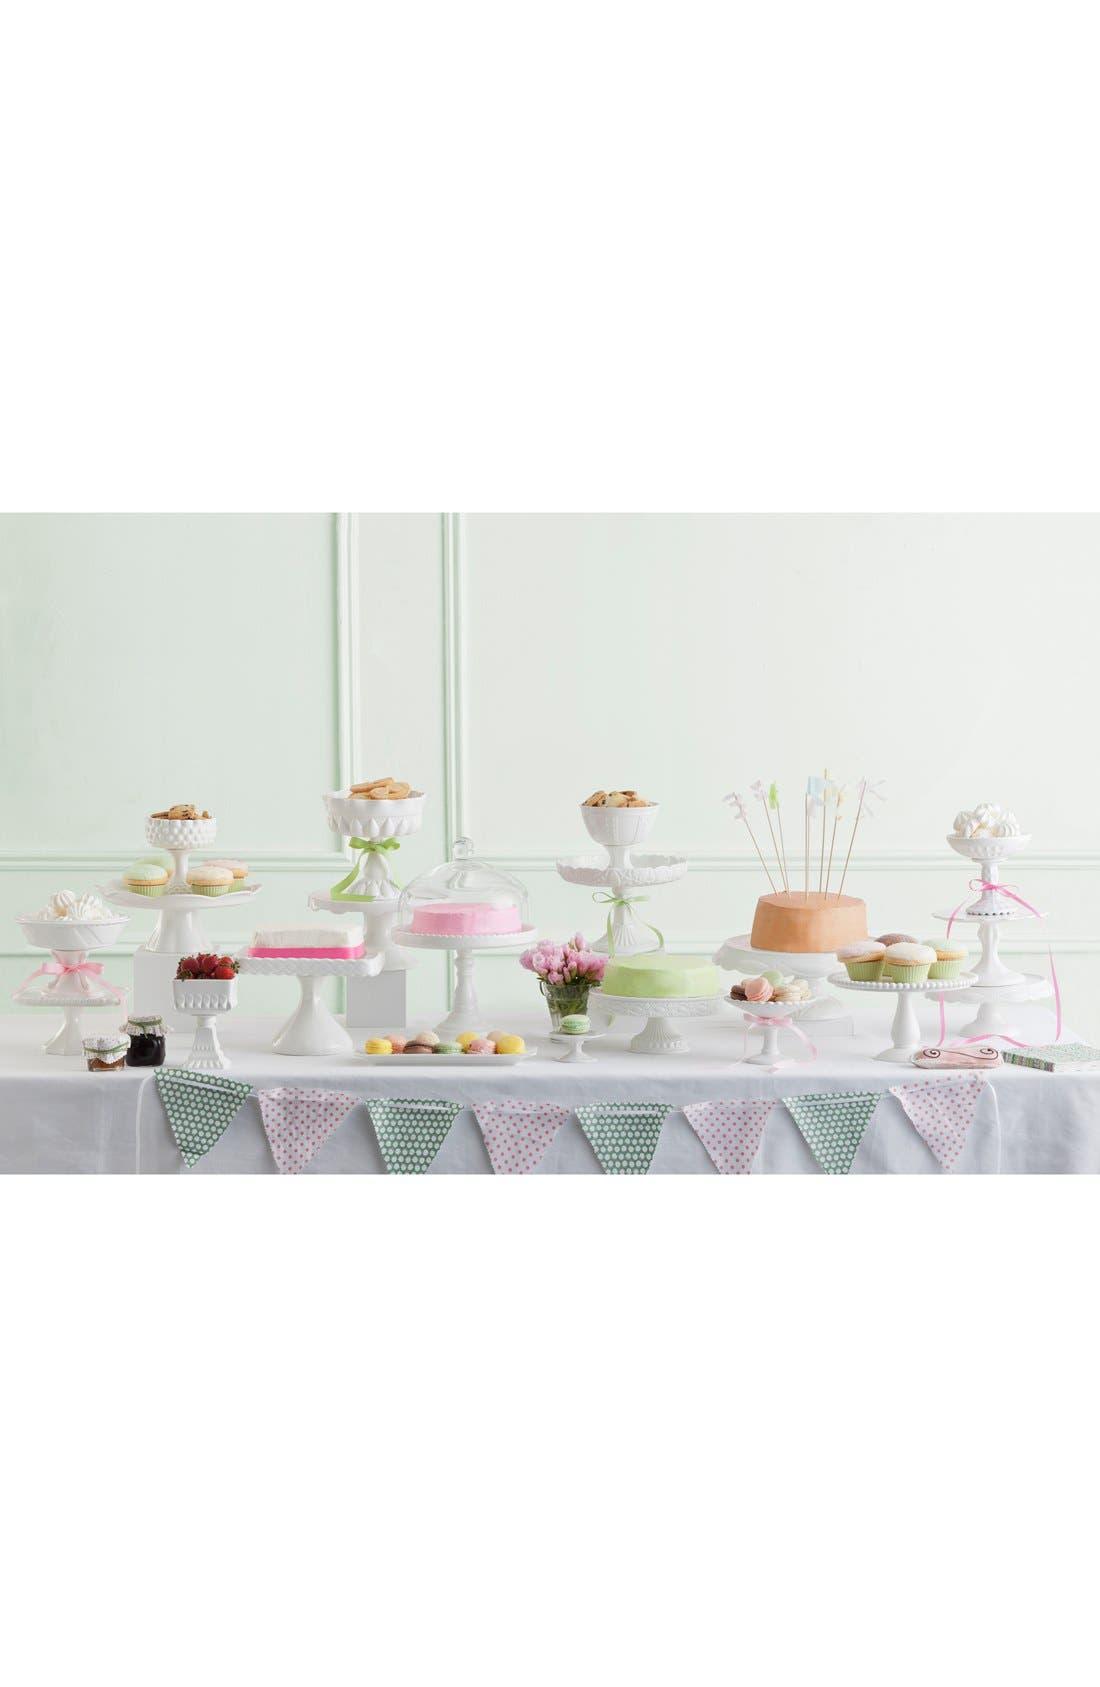 'Décor Bon Bon' Footed Square Cake Stand Pedestal,                             Alternate thumbnail 2, color,                             100